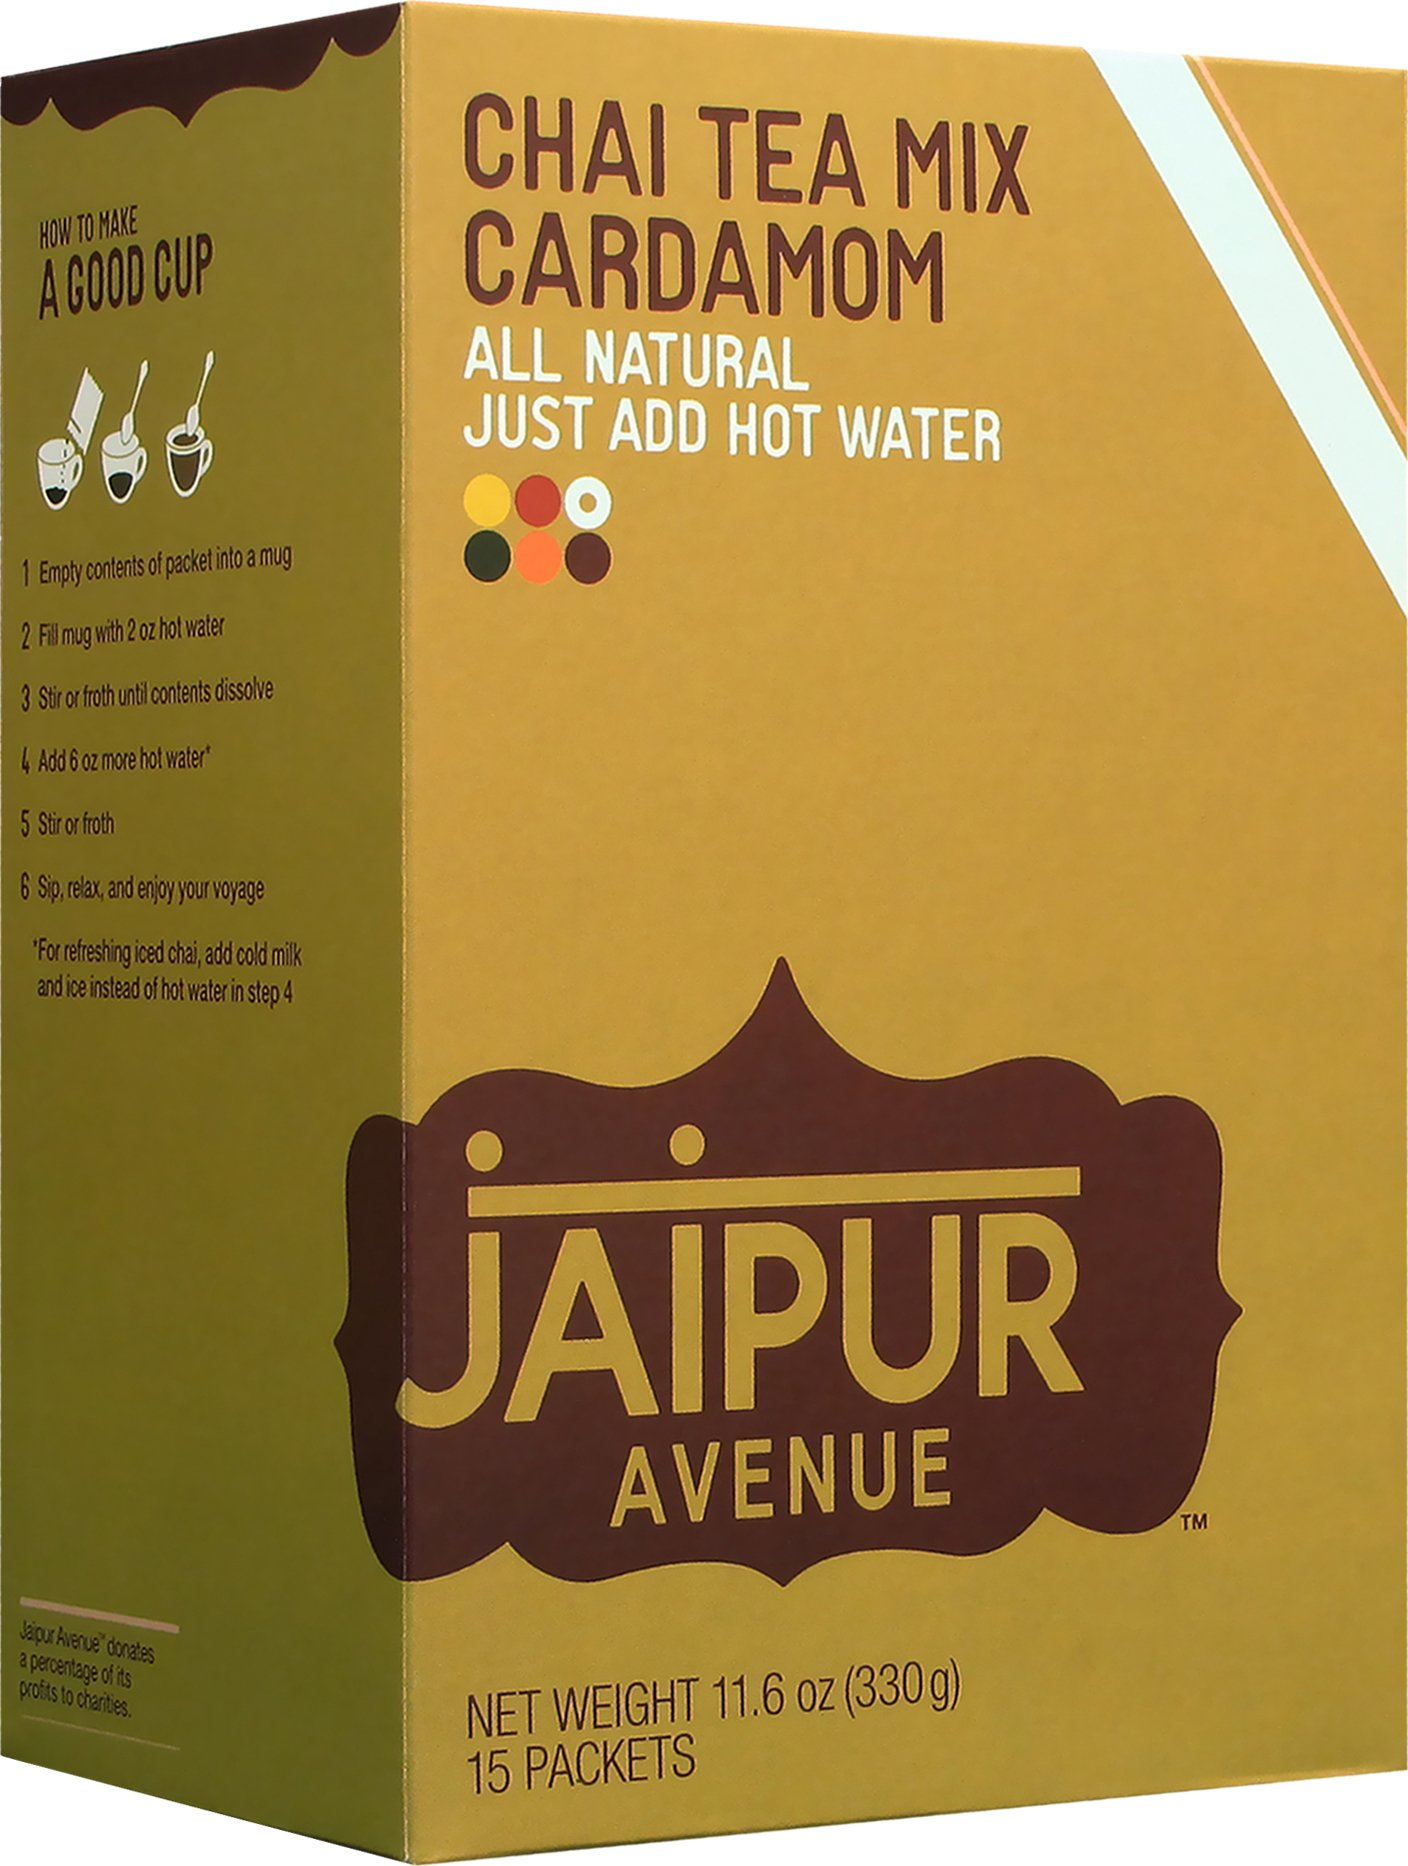 Jaipur Avenue Chai Tea Mix Cardamom